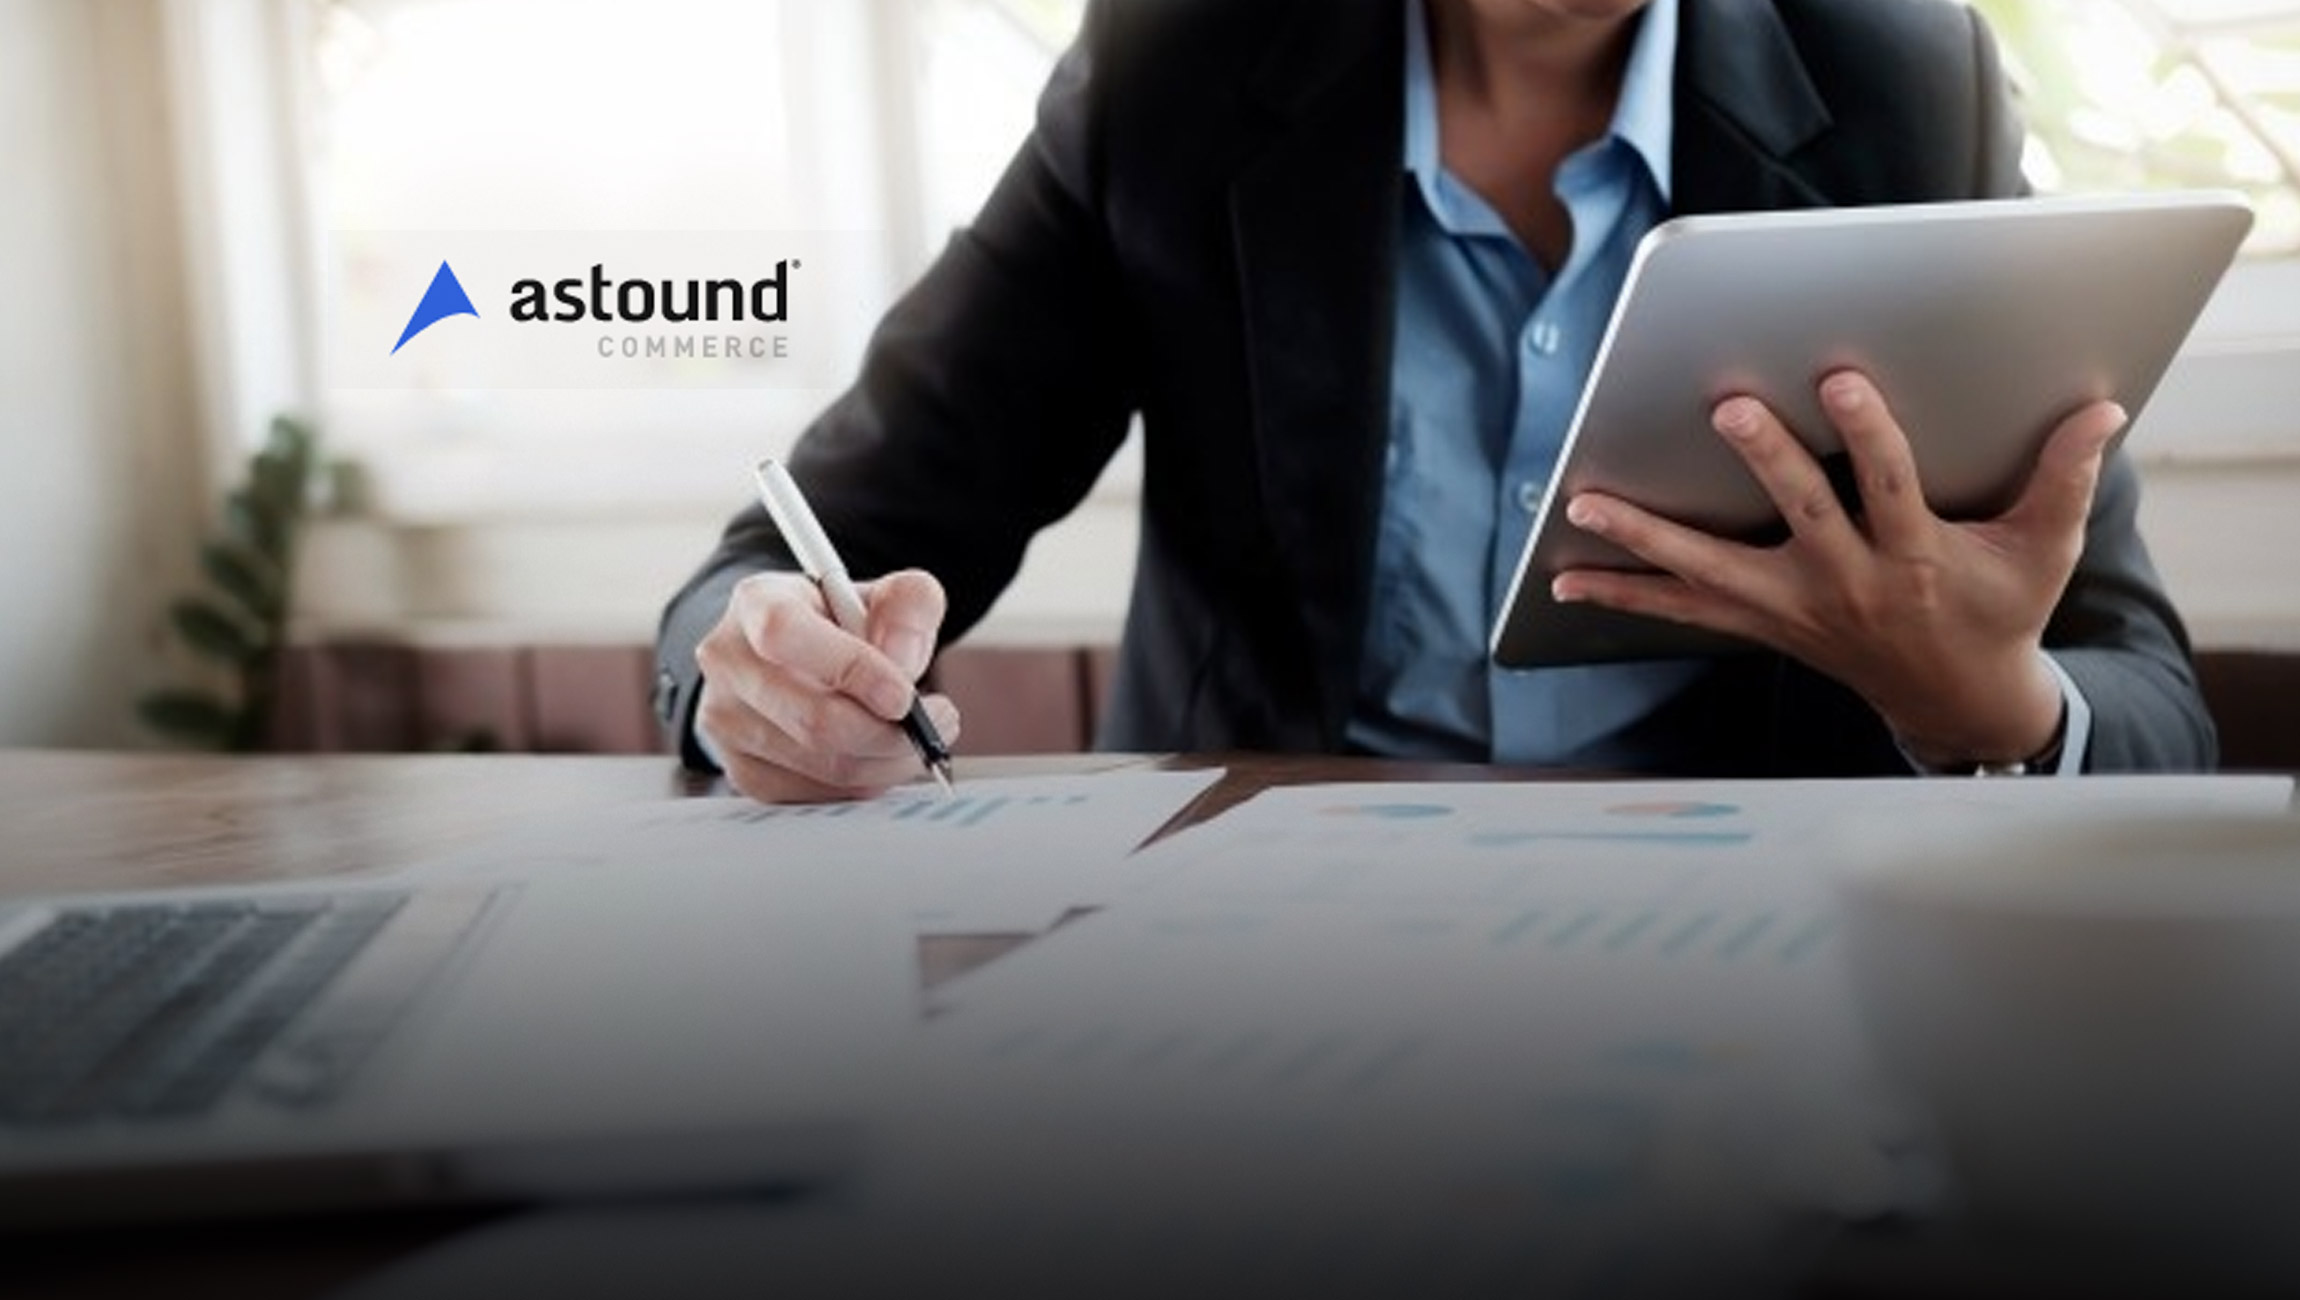 Digital Marketing Leader Michael Kahn Named Global CEO of Astound Commerce